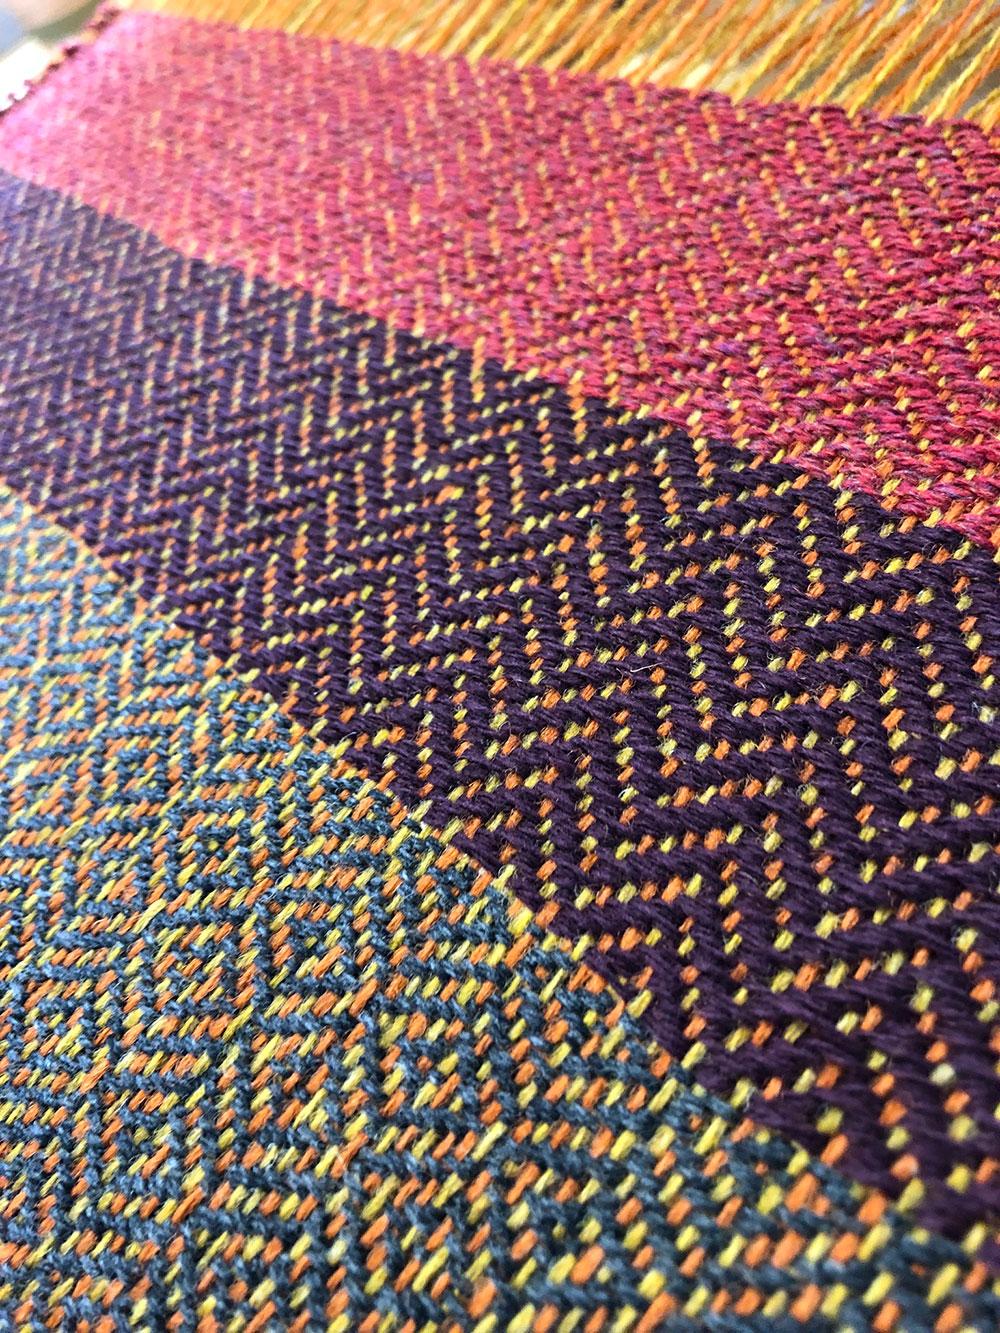 Weaving Tweed and Textures